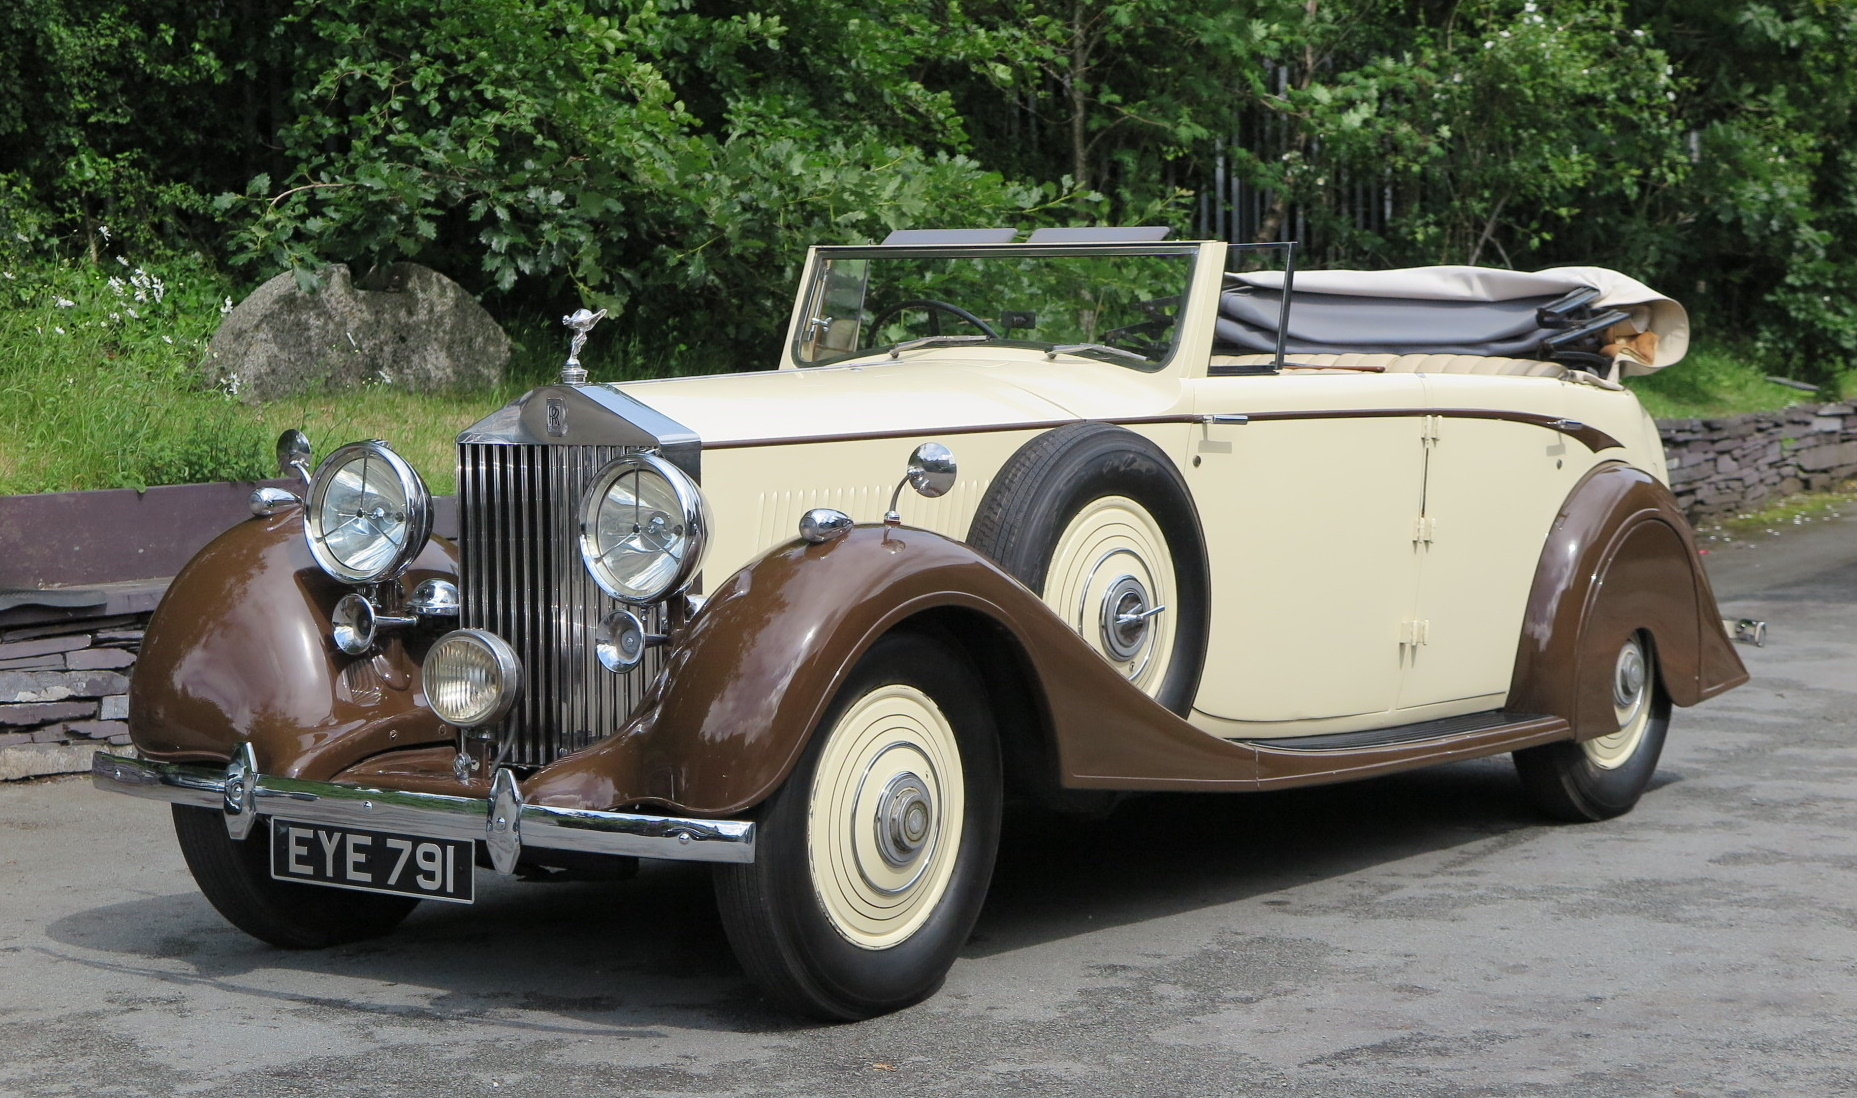 1938 Rolls-Royce 25/30 Park Ward 4 Dr  Cabriolet GGR54 For Sale (picture 1 of 6)